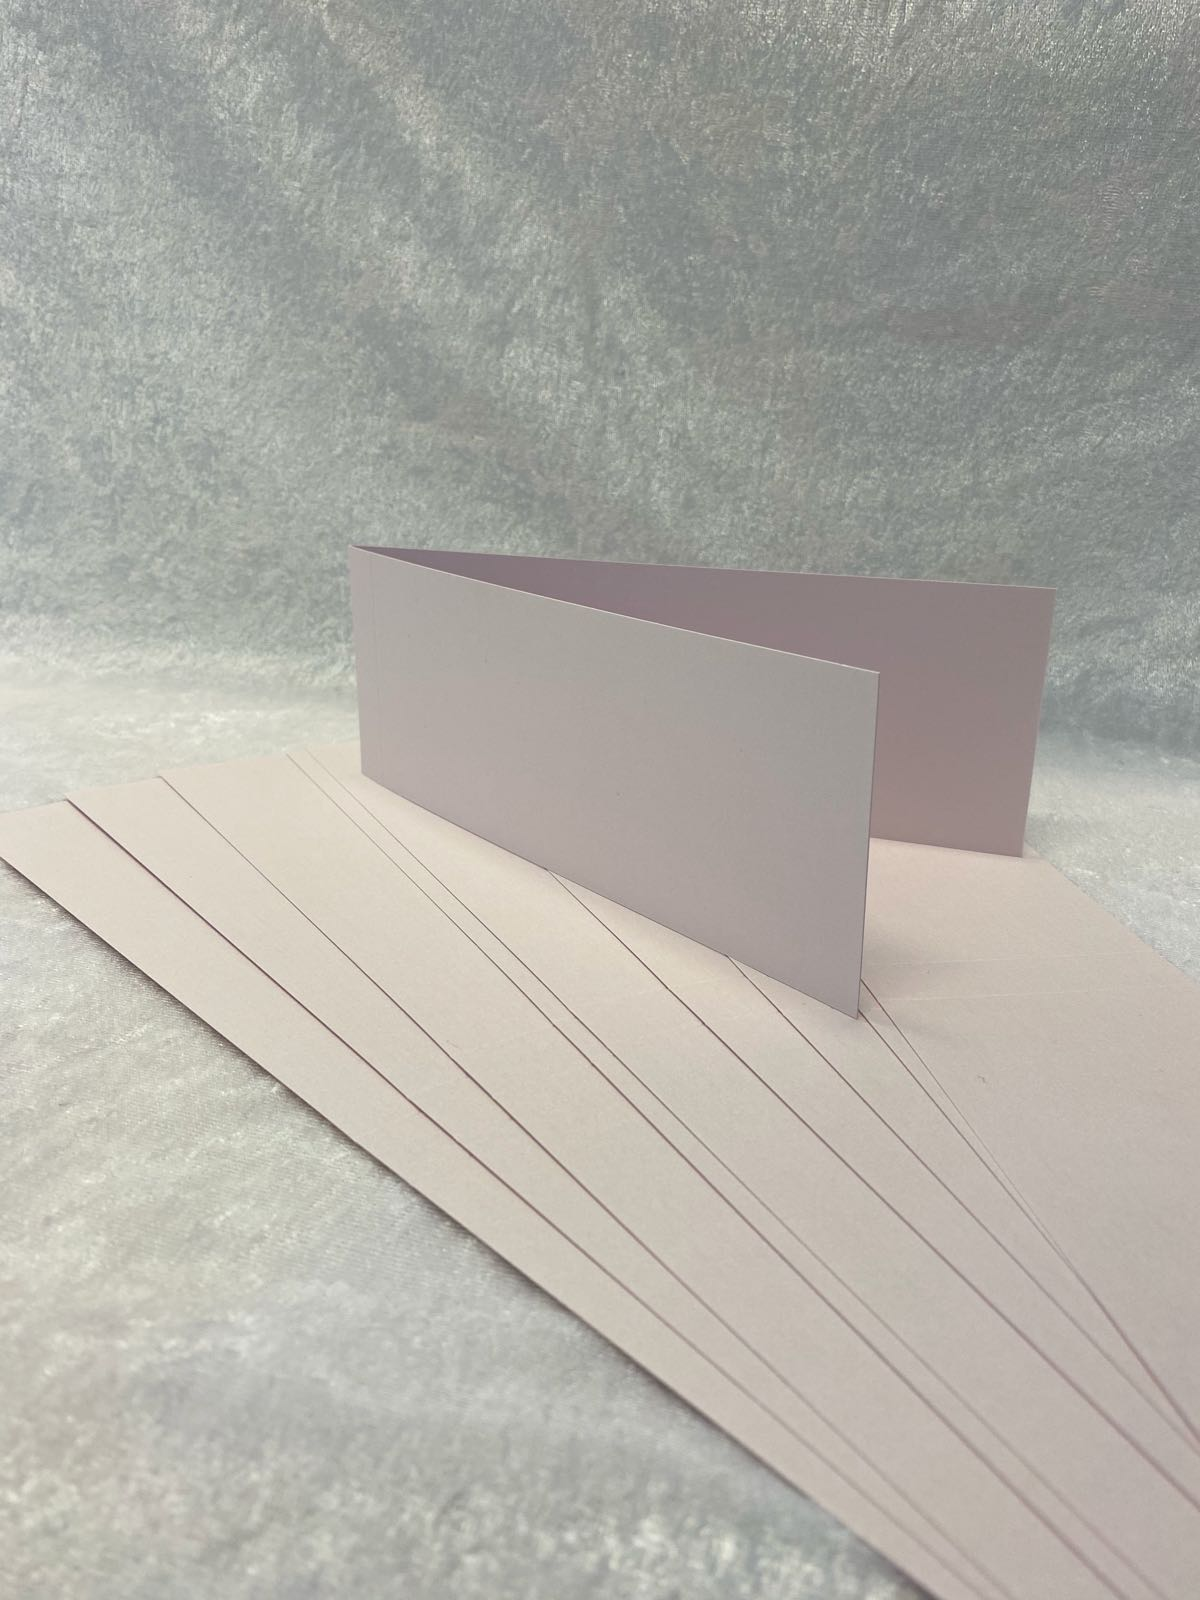 Slimcard base shimmer lys rosa. TILBUD: 10 stk. kun kr 25,-